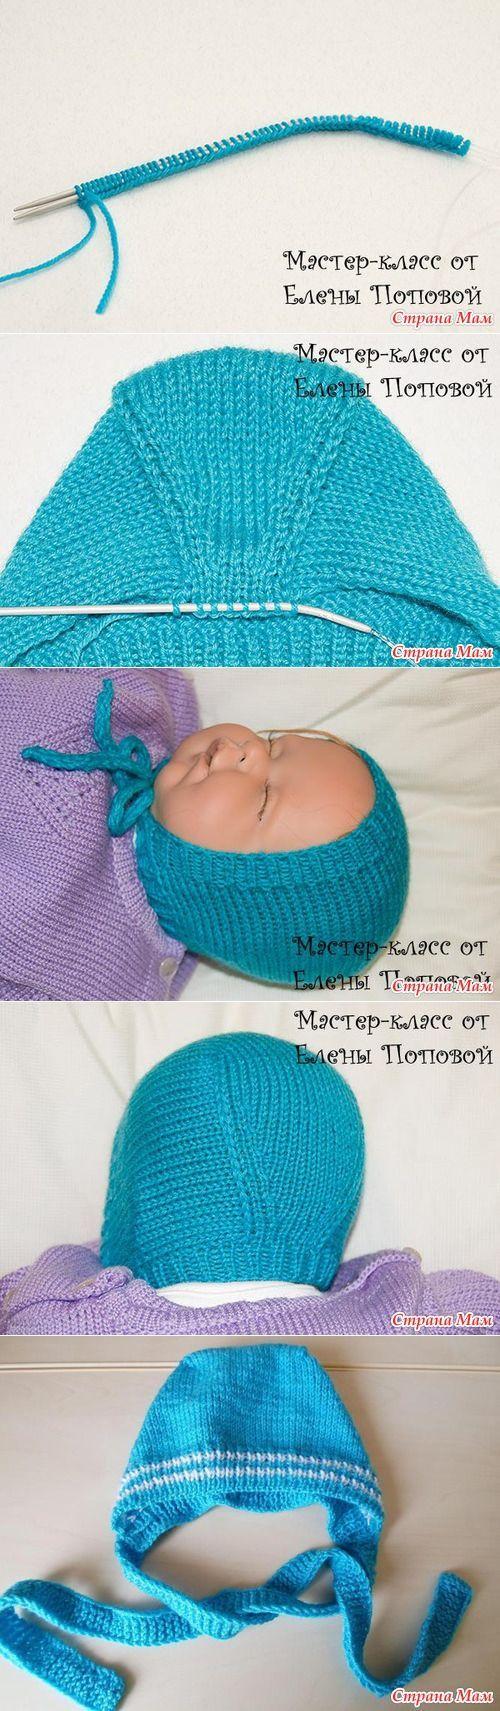 Caps for newborns. - Knitting for children - Country Mom